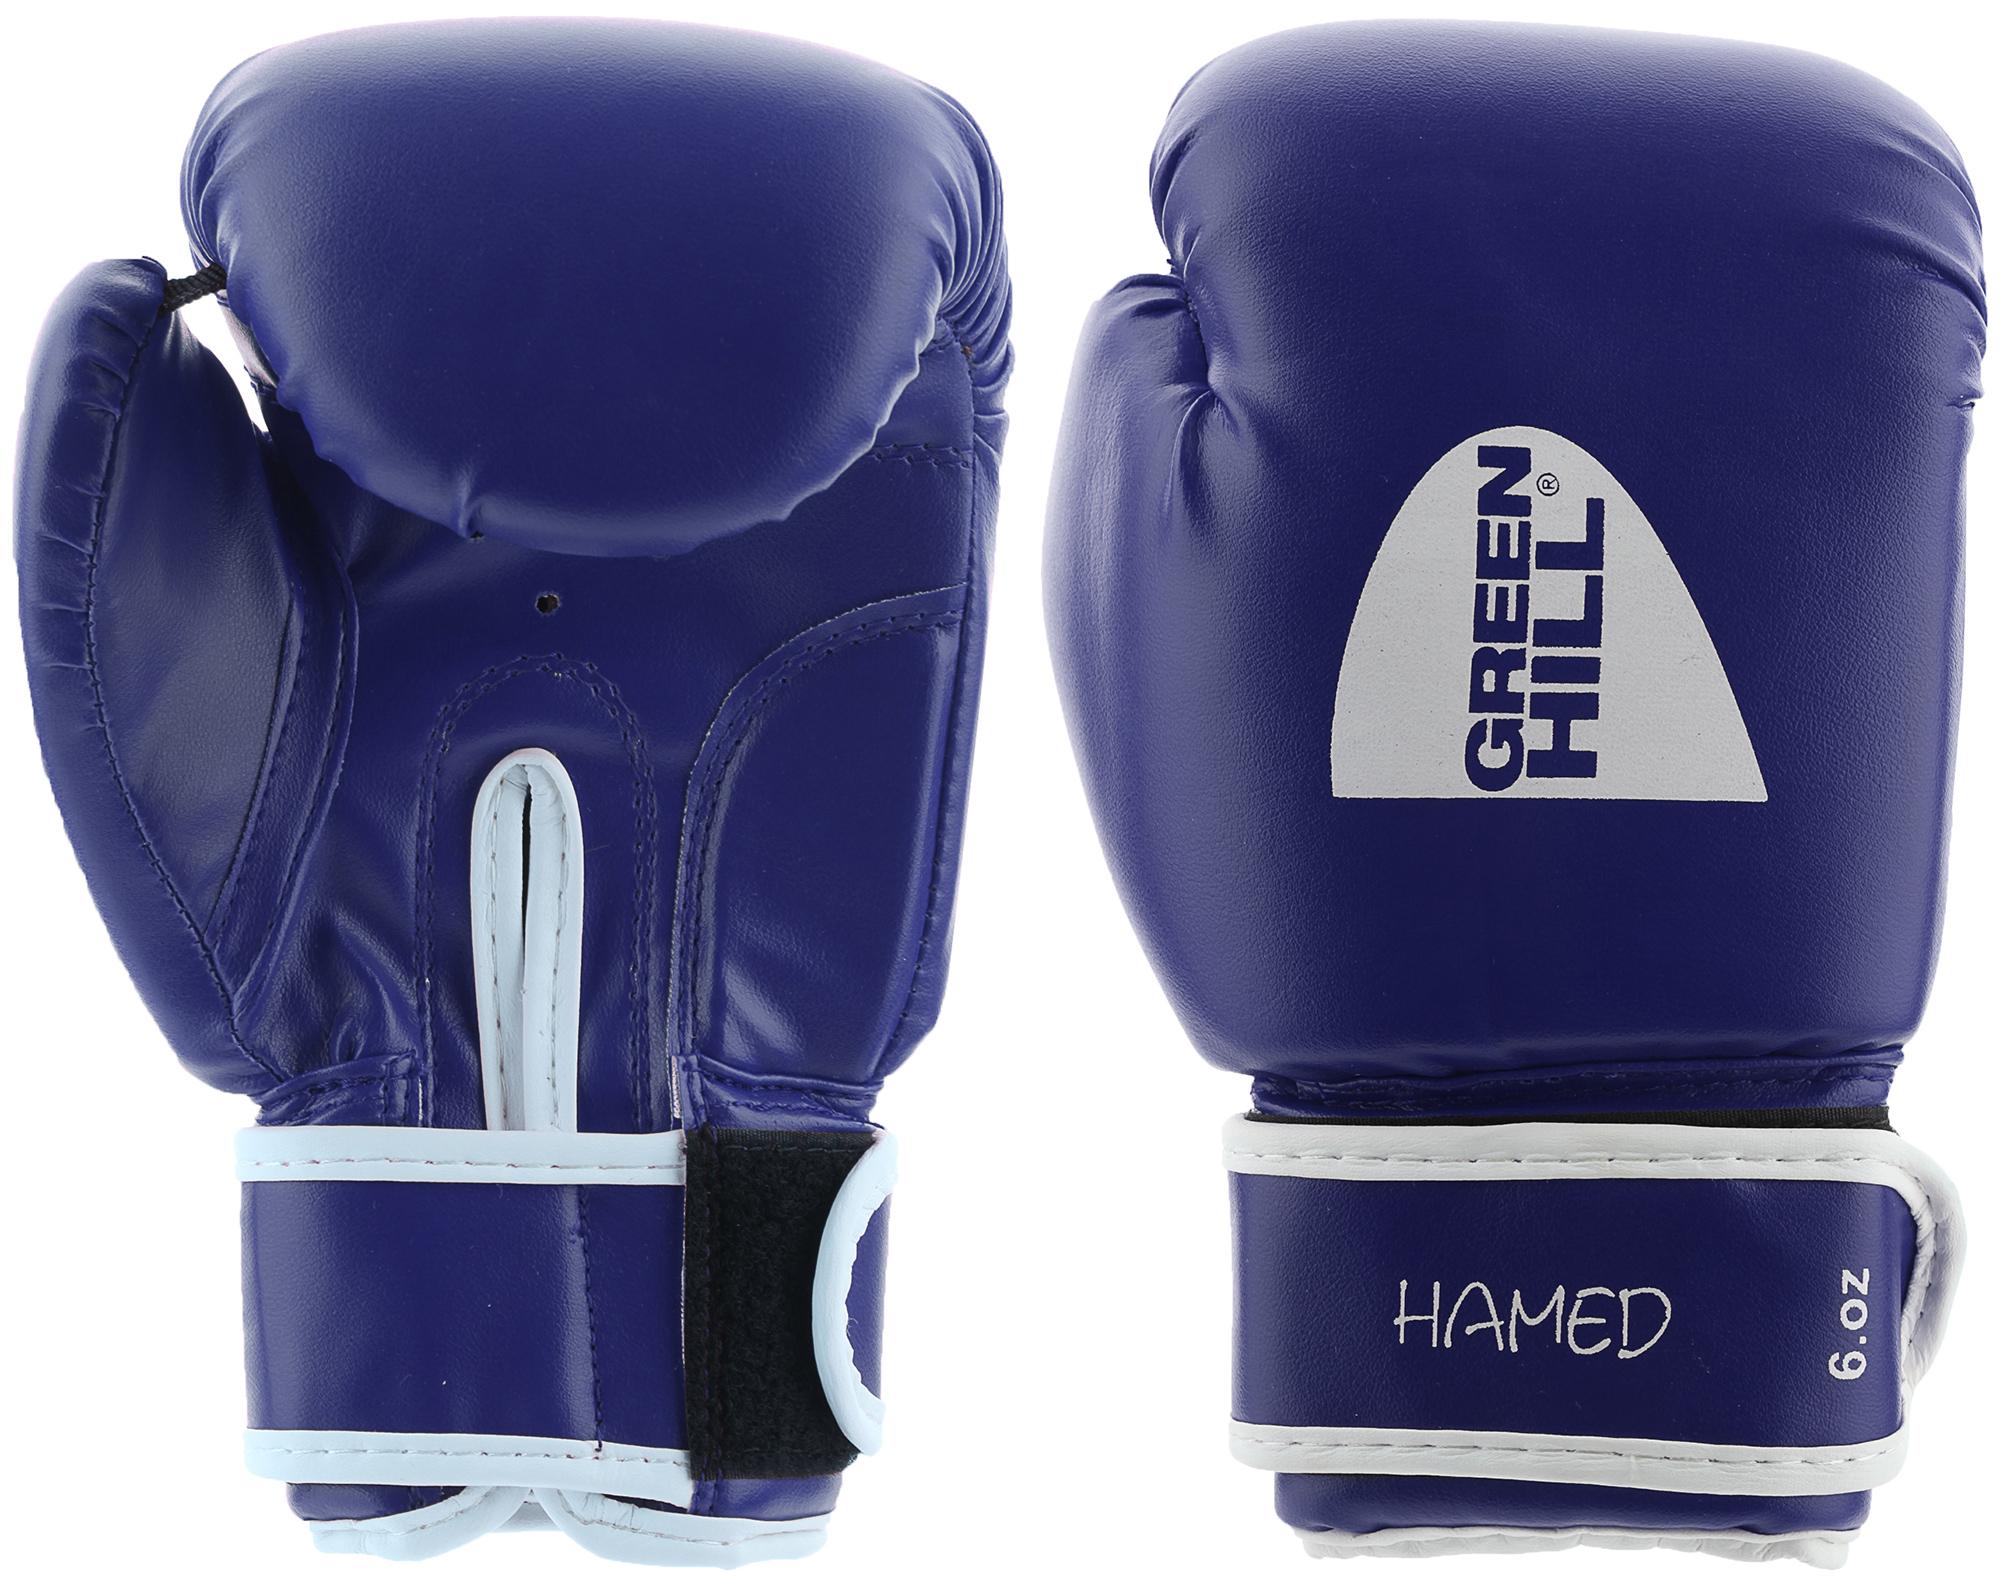 цена на Green Hill Перчатки боксерские детские Green Hill Hamed, размер 6 oz